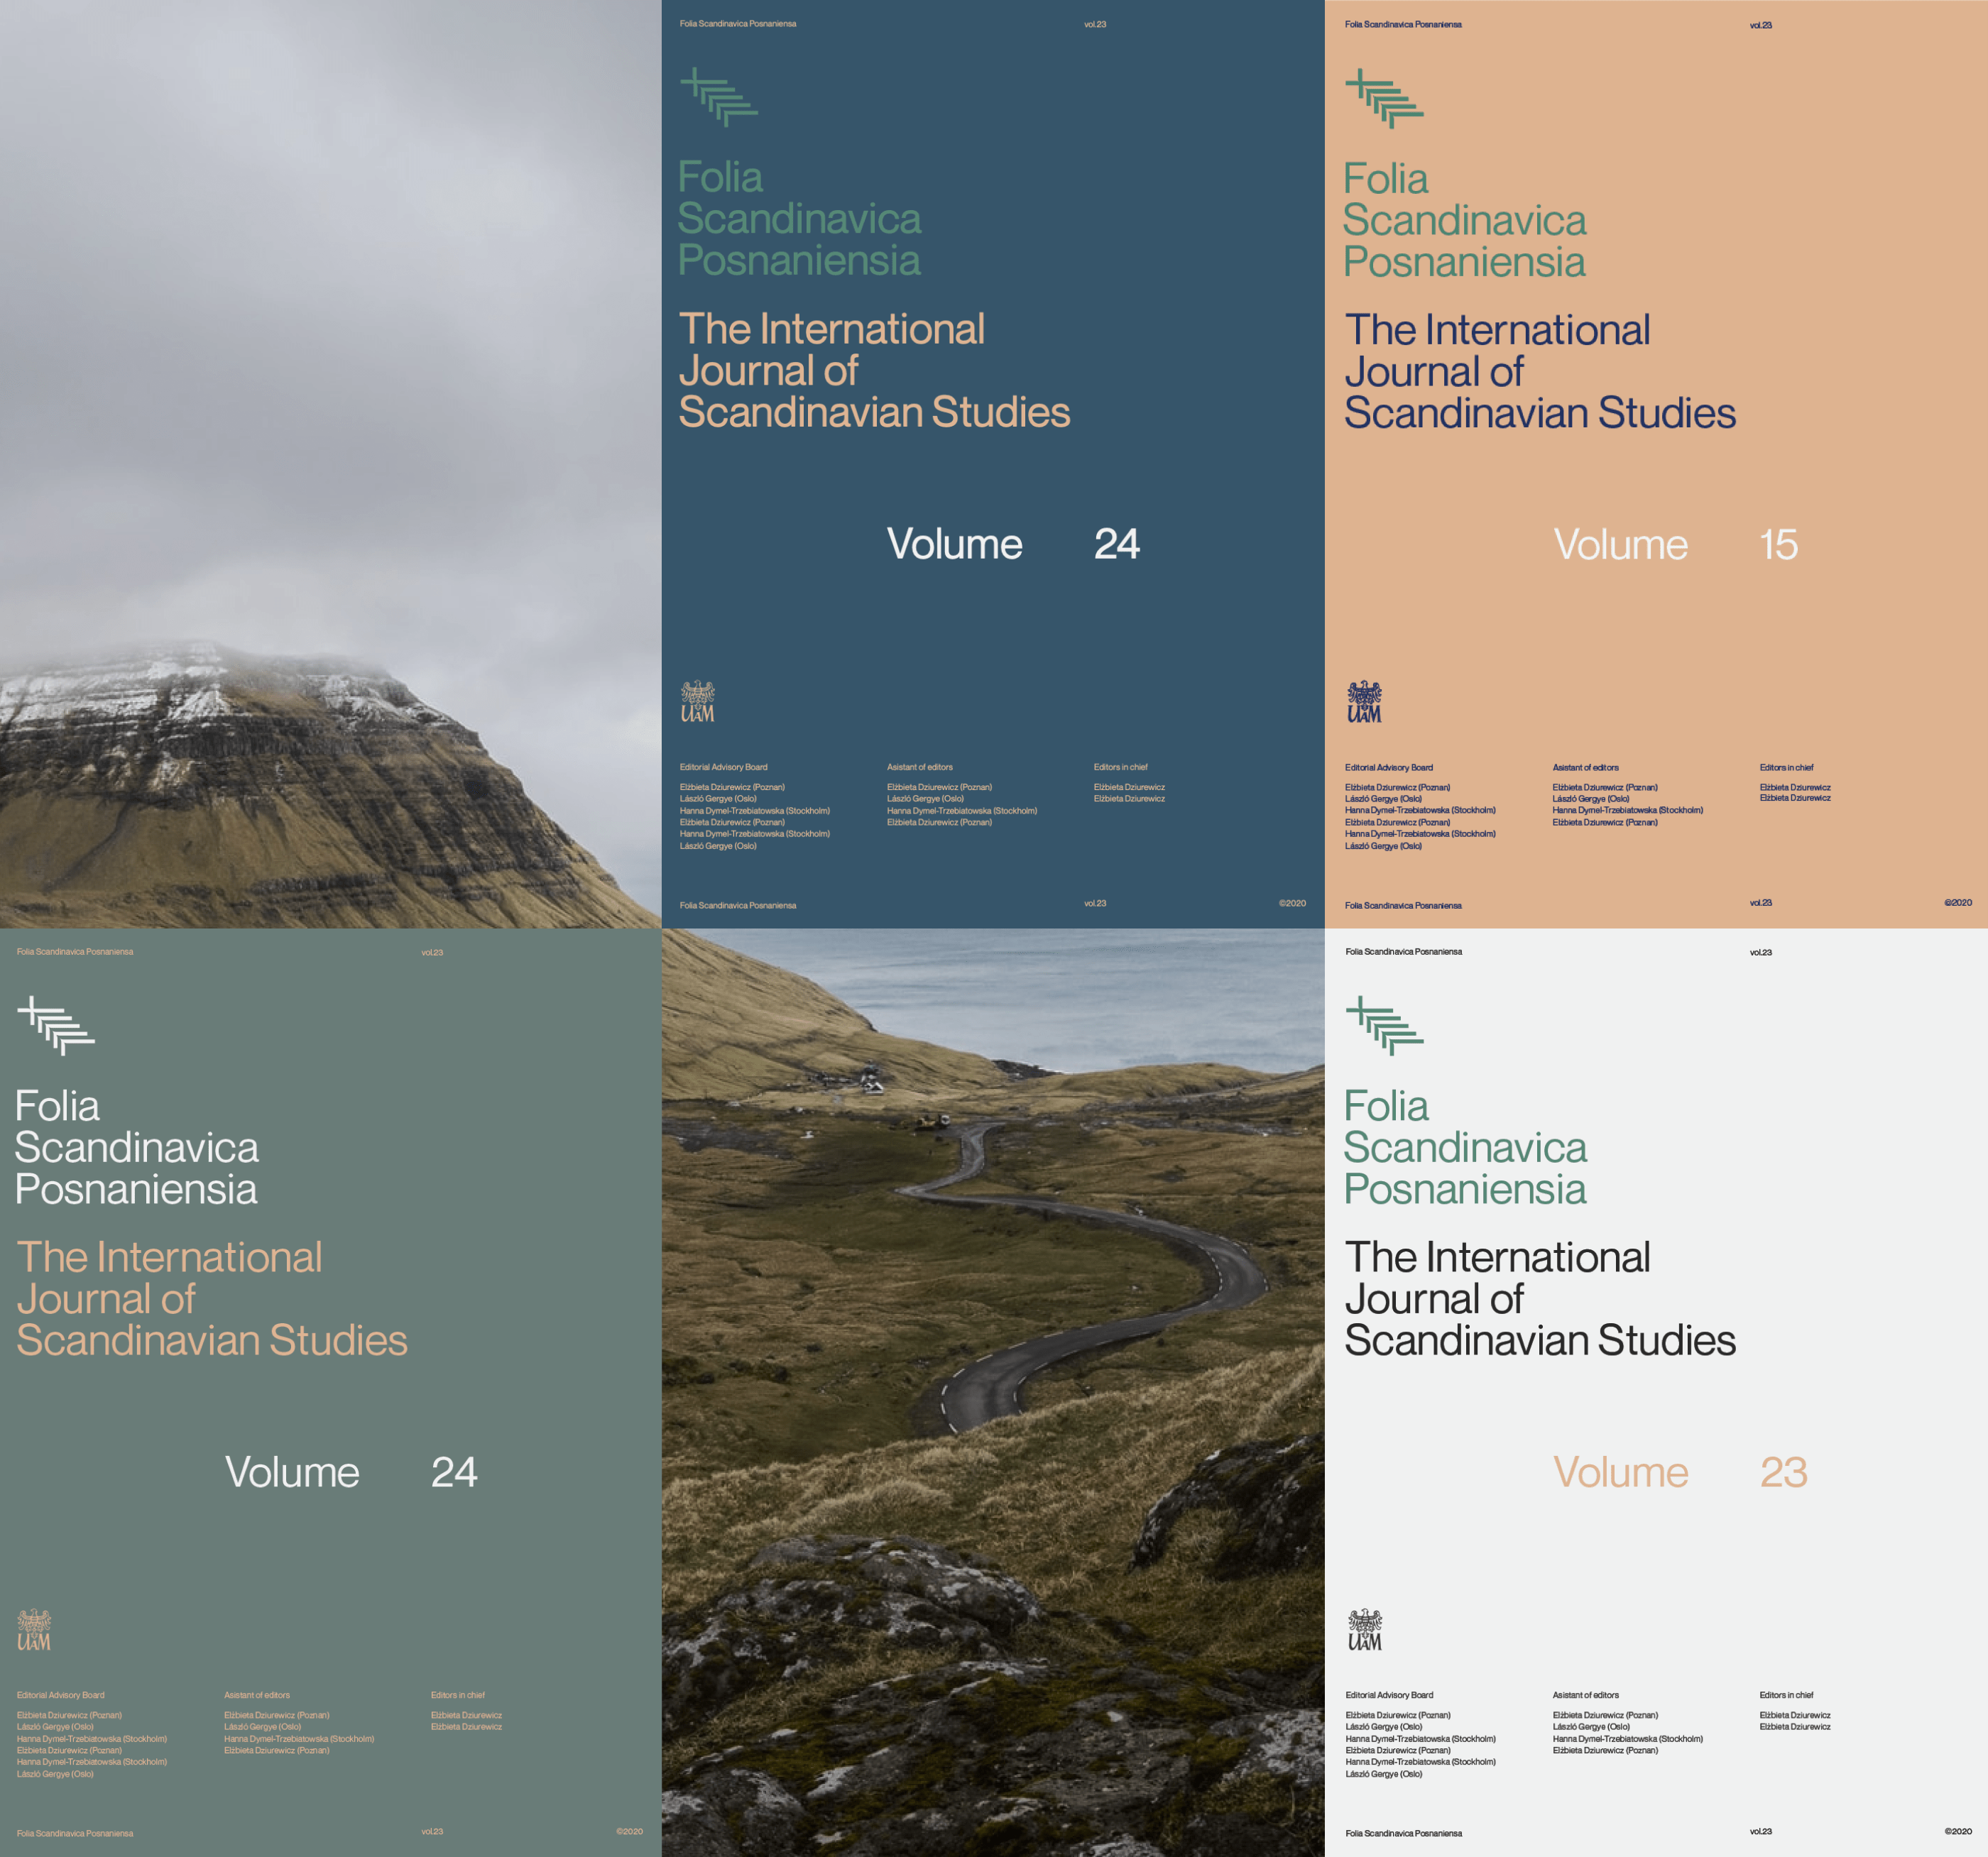 Publications - Folia Scandinavica Posnaniensia